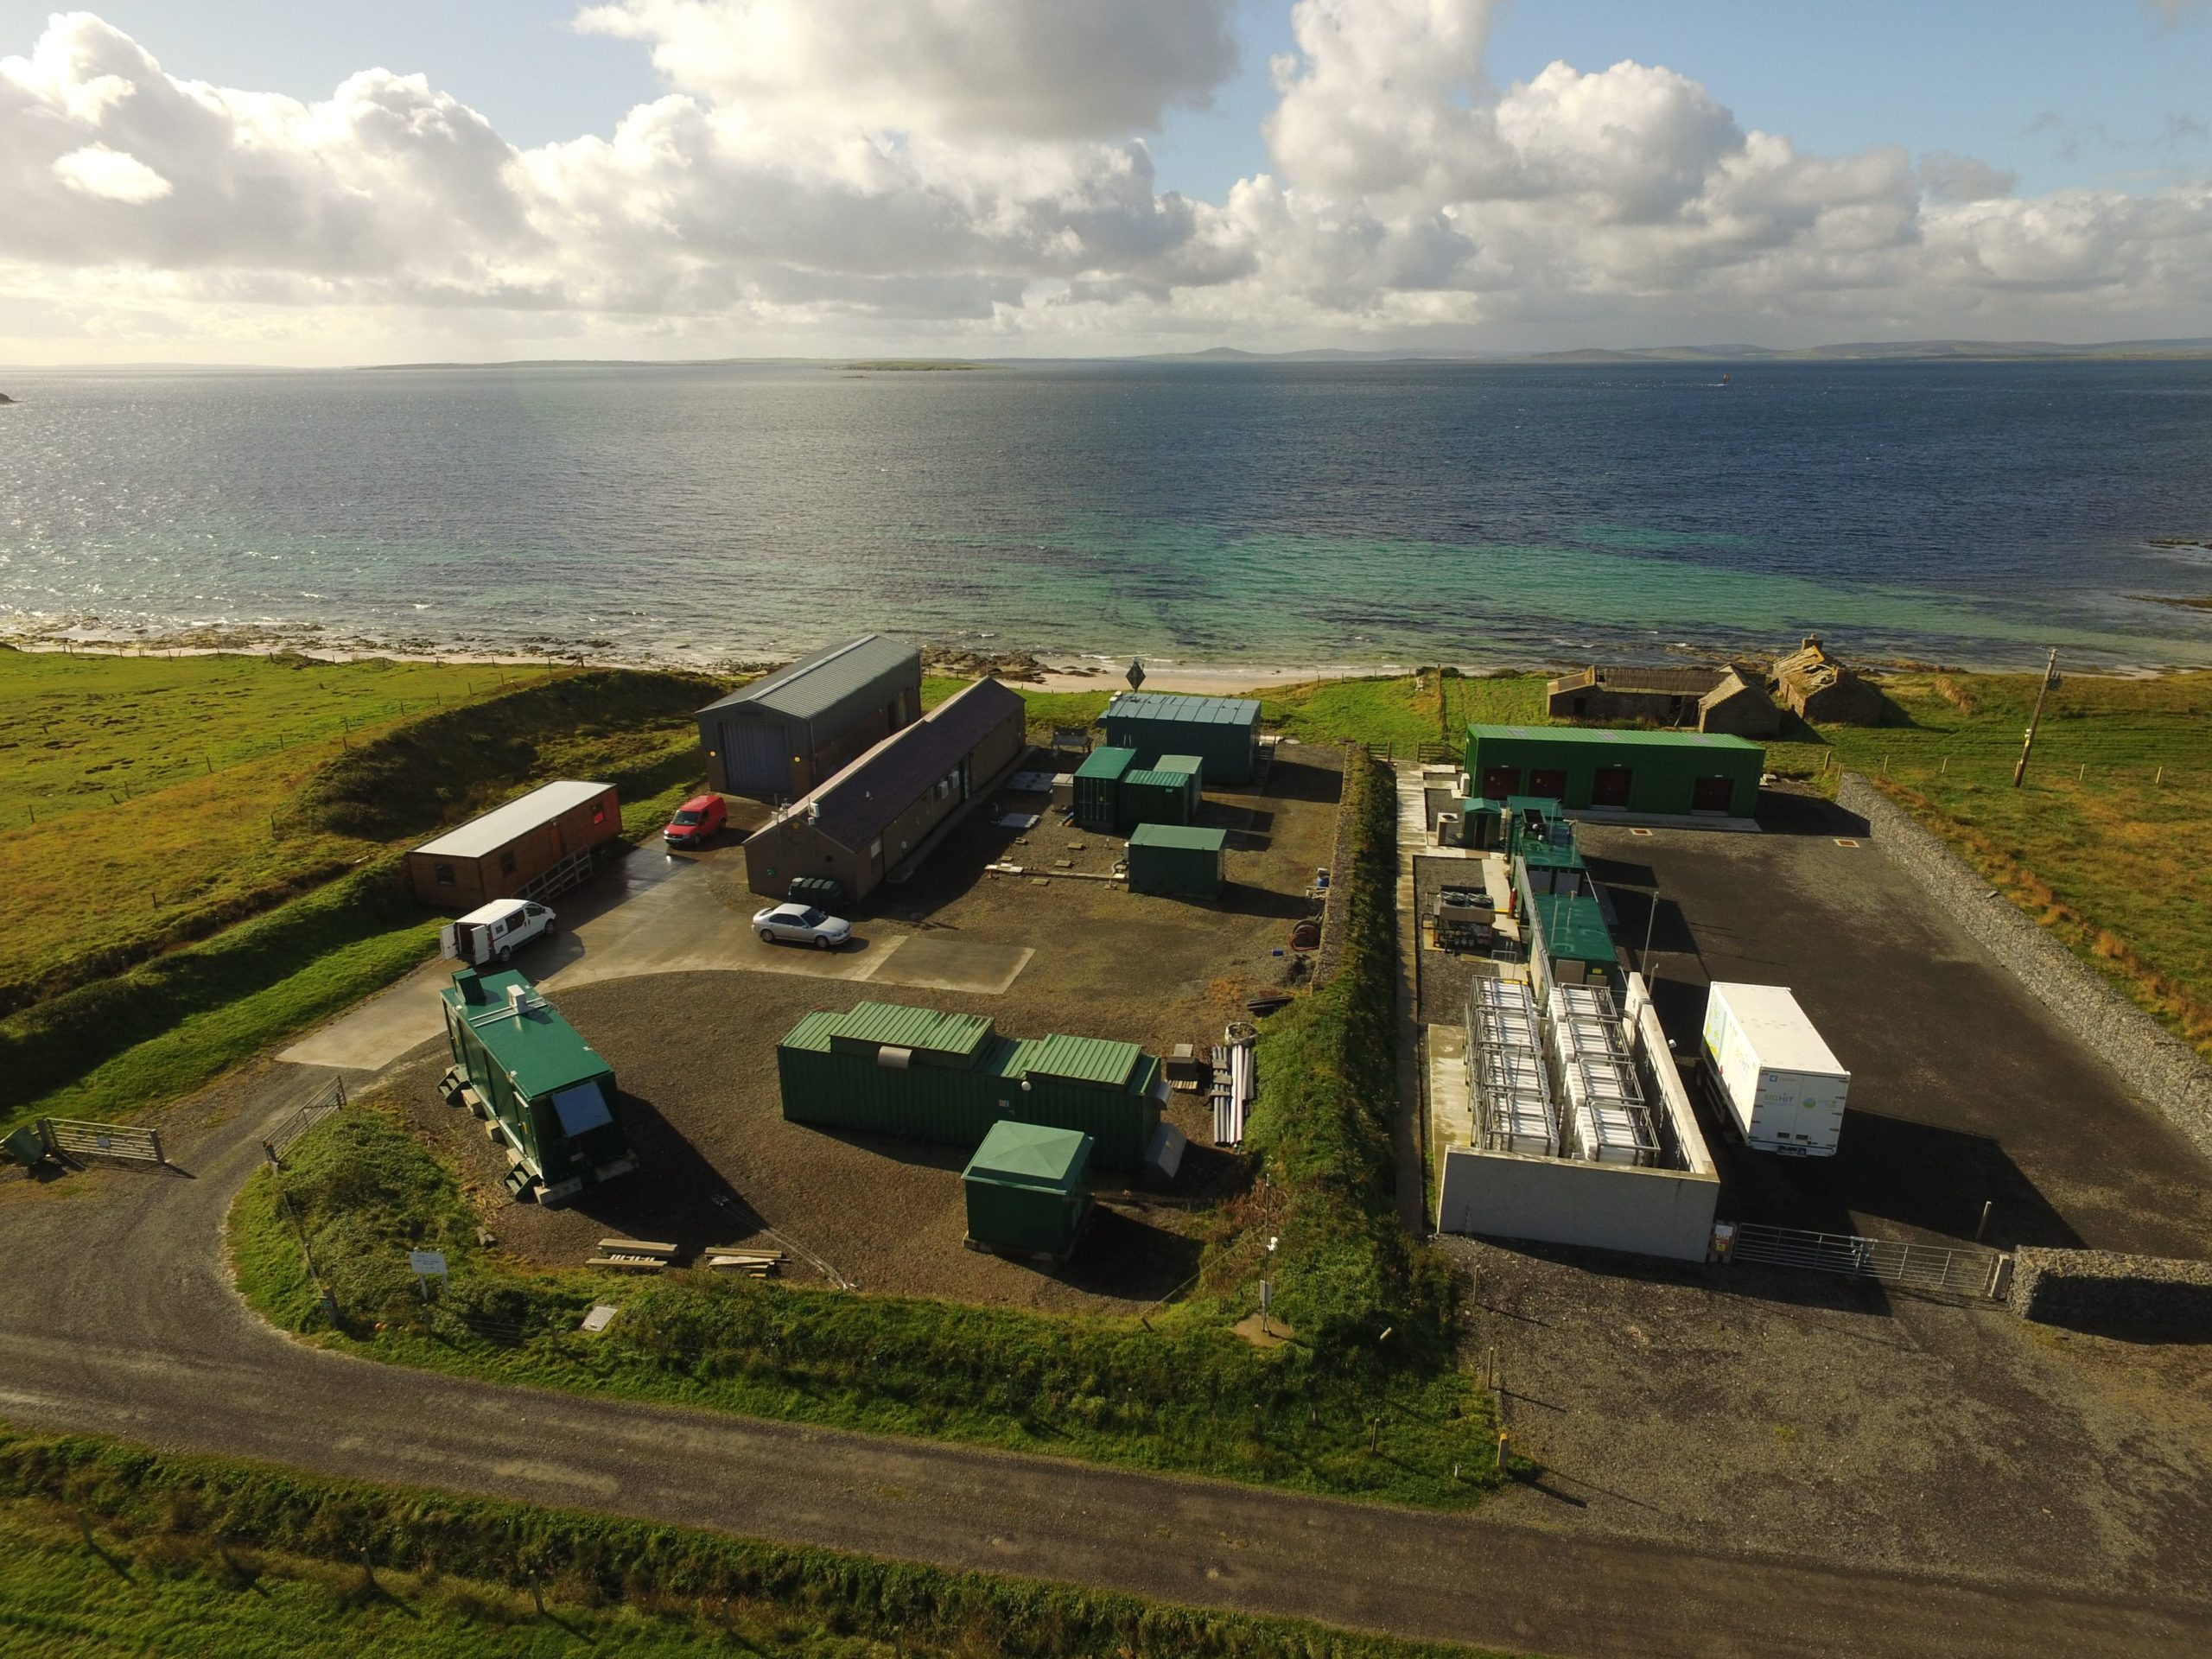 EMEC's hydrogen production facilities on the island of Eday